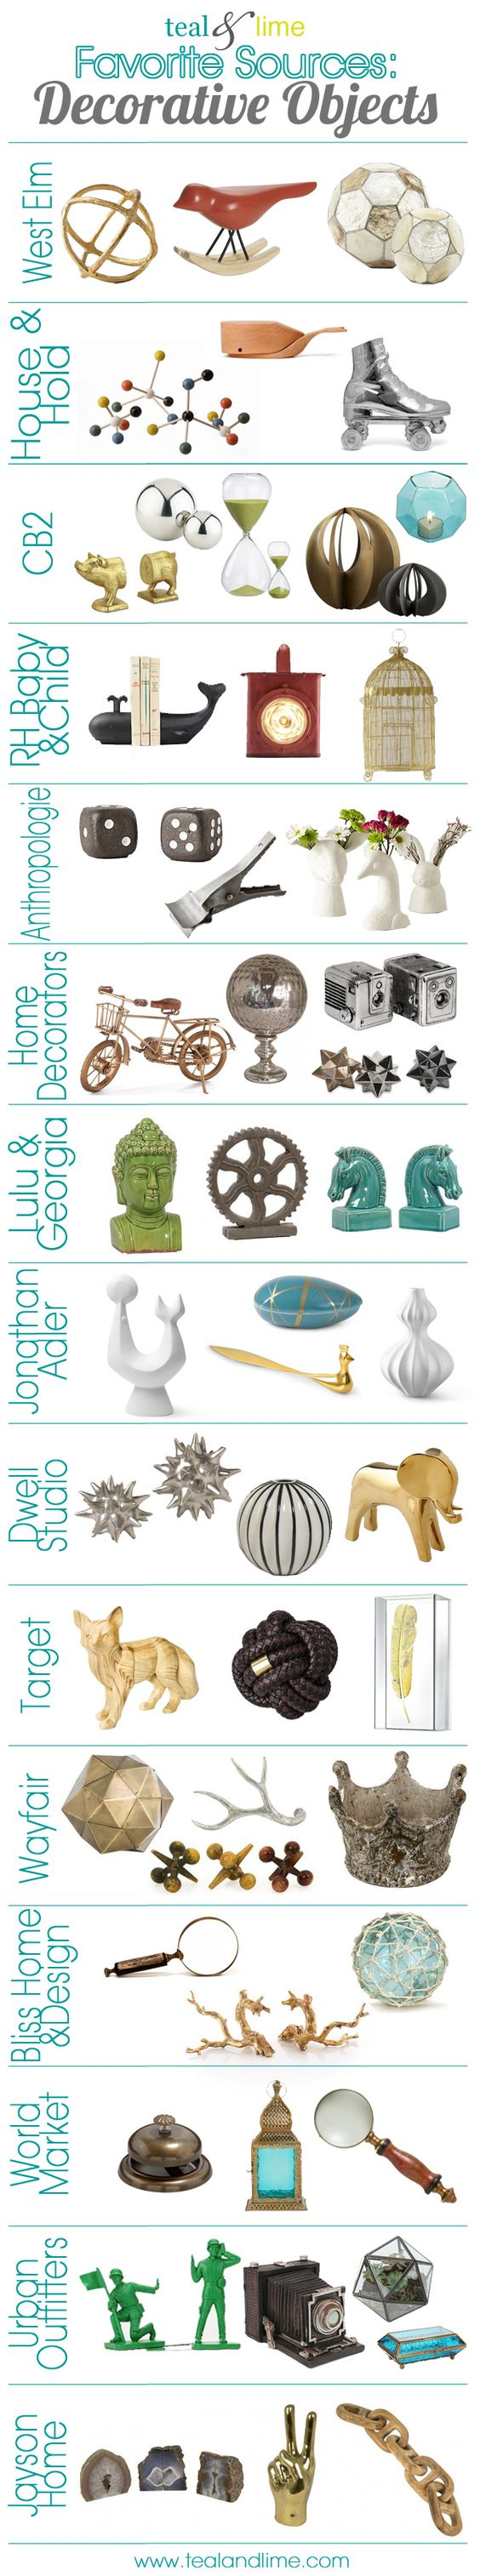 Favorite Sources: Decorative Objects